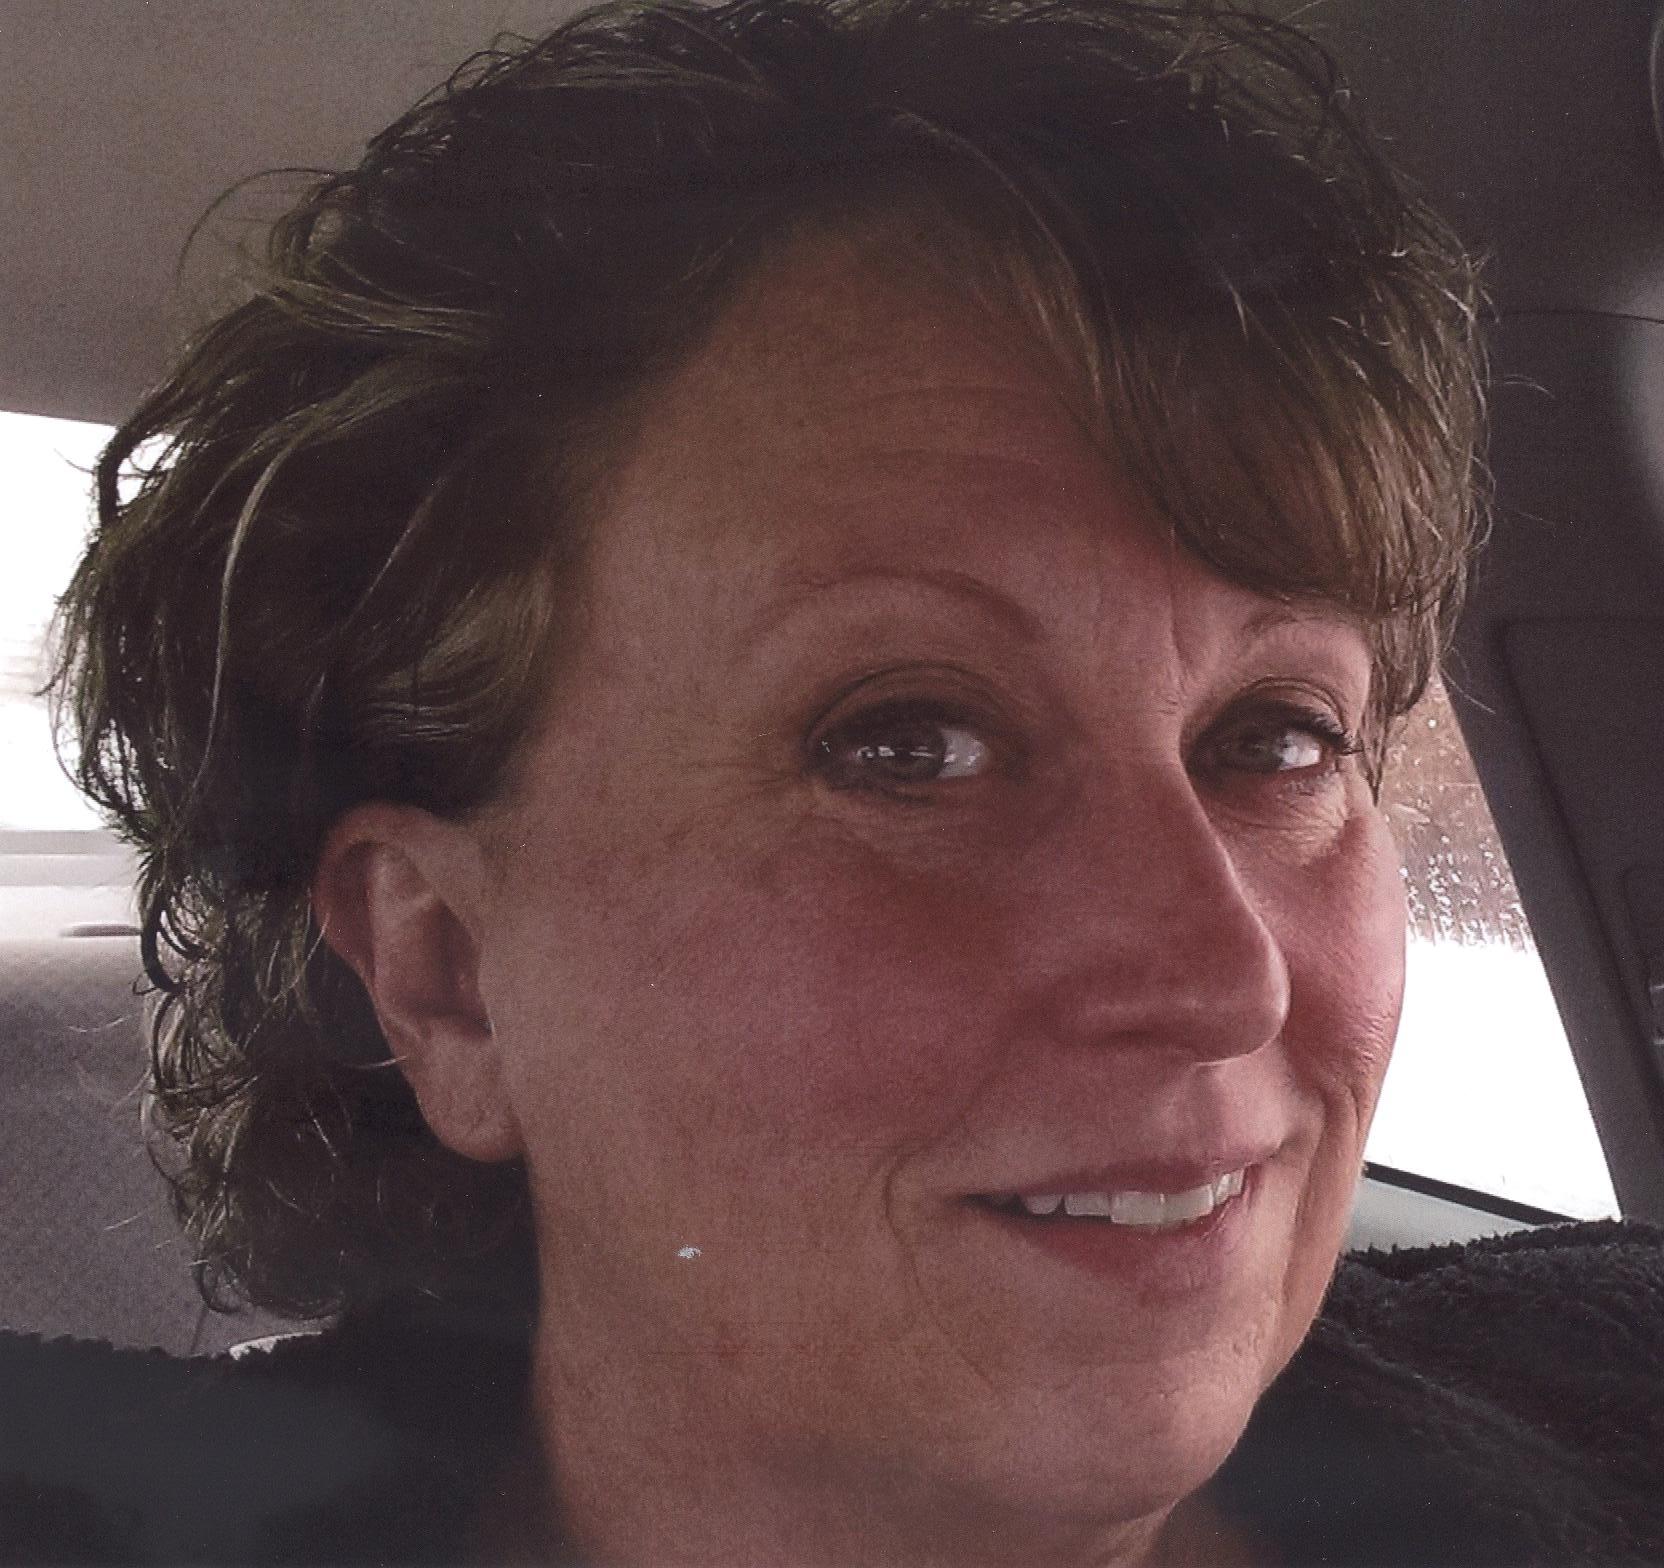 Jill Kohler Obituary, Marcy, NY | Dimbleby, Friedel, Williams & Edmunds Funeral Homes - New Hartford, Whitesboro, Utica, West Winfield, Holland Patent, ... - 845784